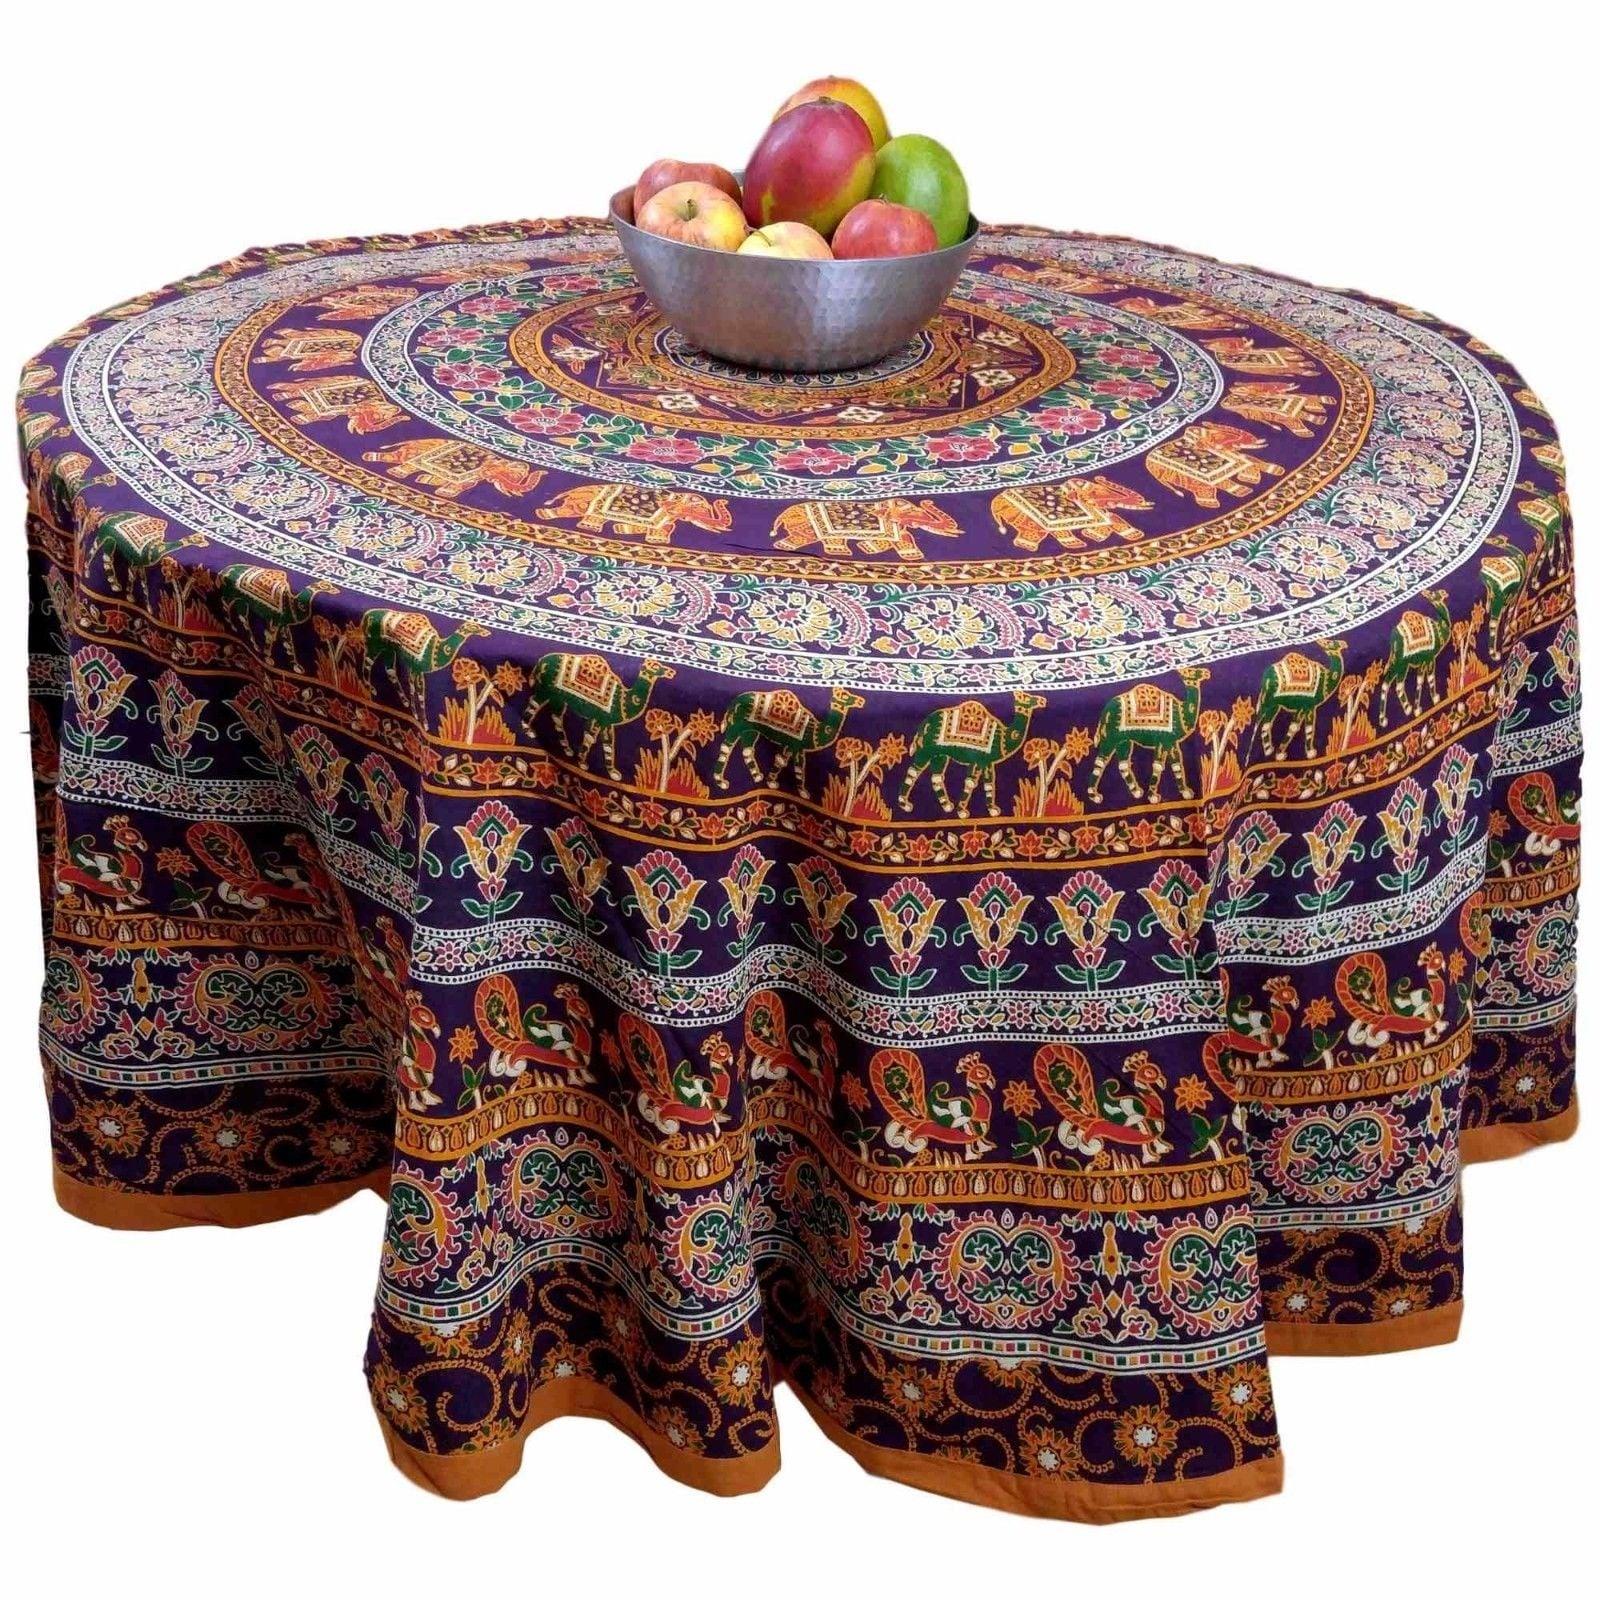 "Handmade 100% Cotton Elephant Mandala Floral 81"" Round Tablecloth Burgundy Mustard - Thumbnail 0"